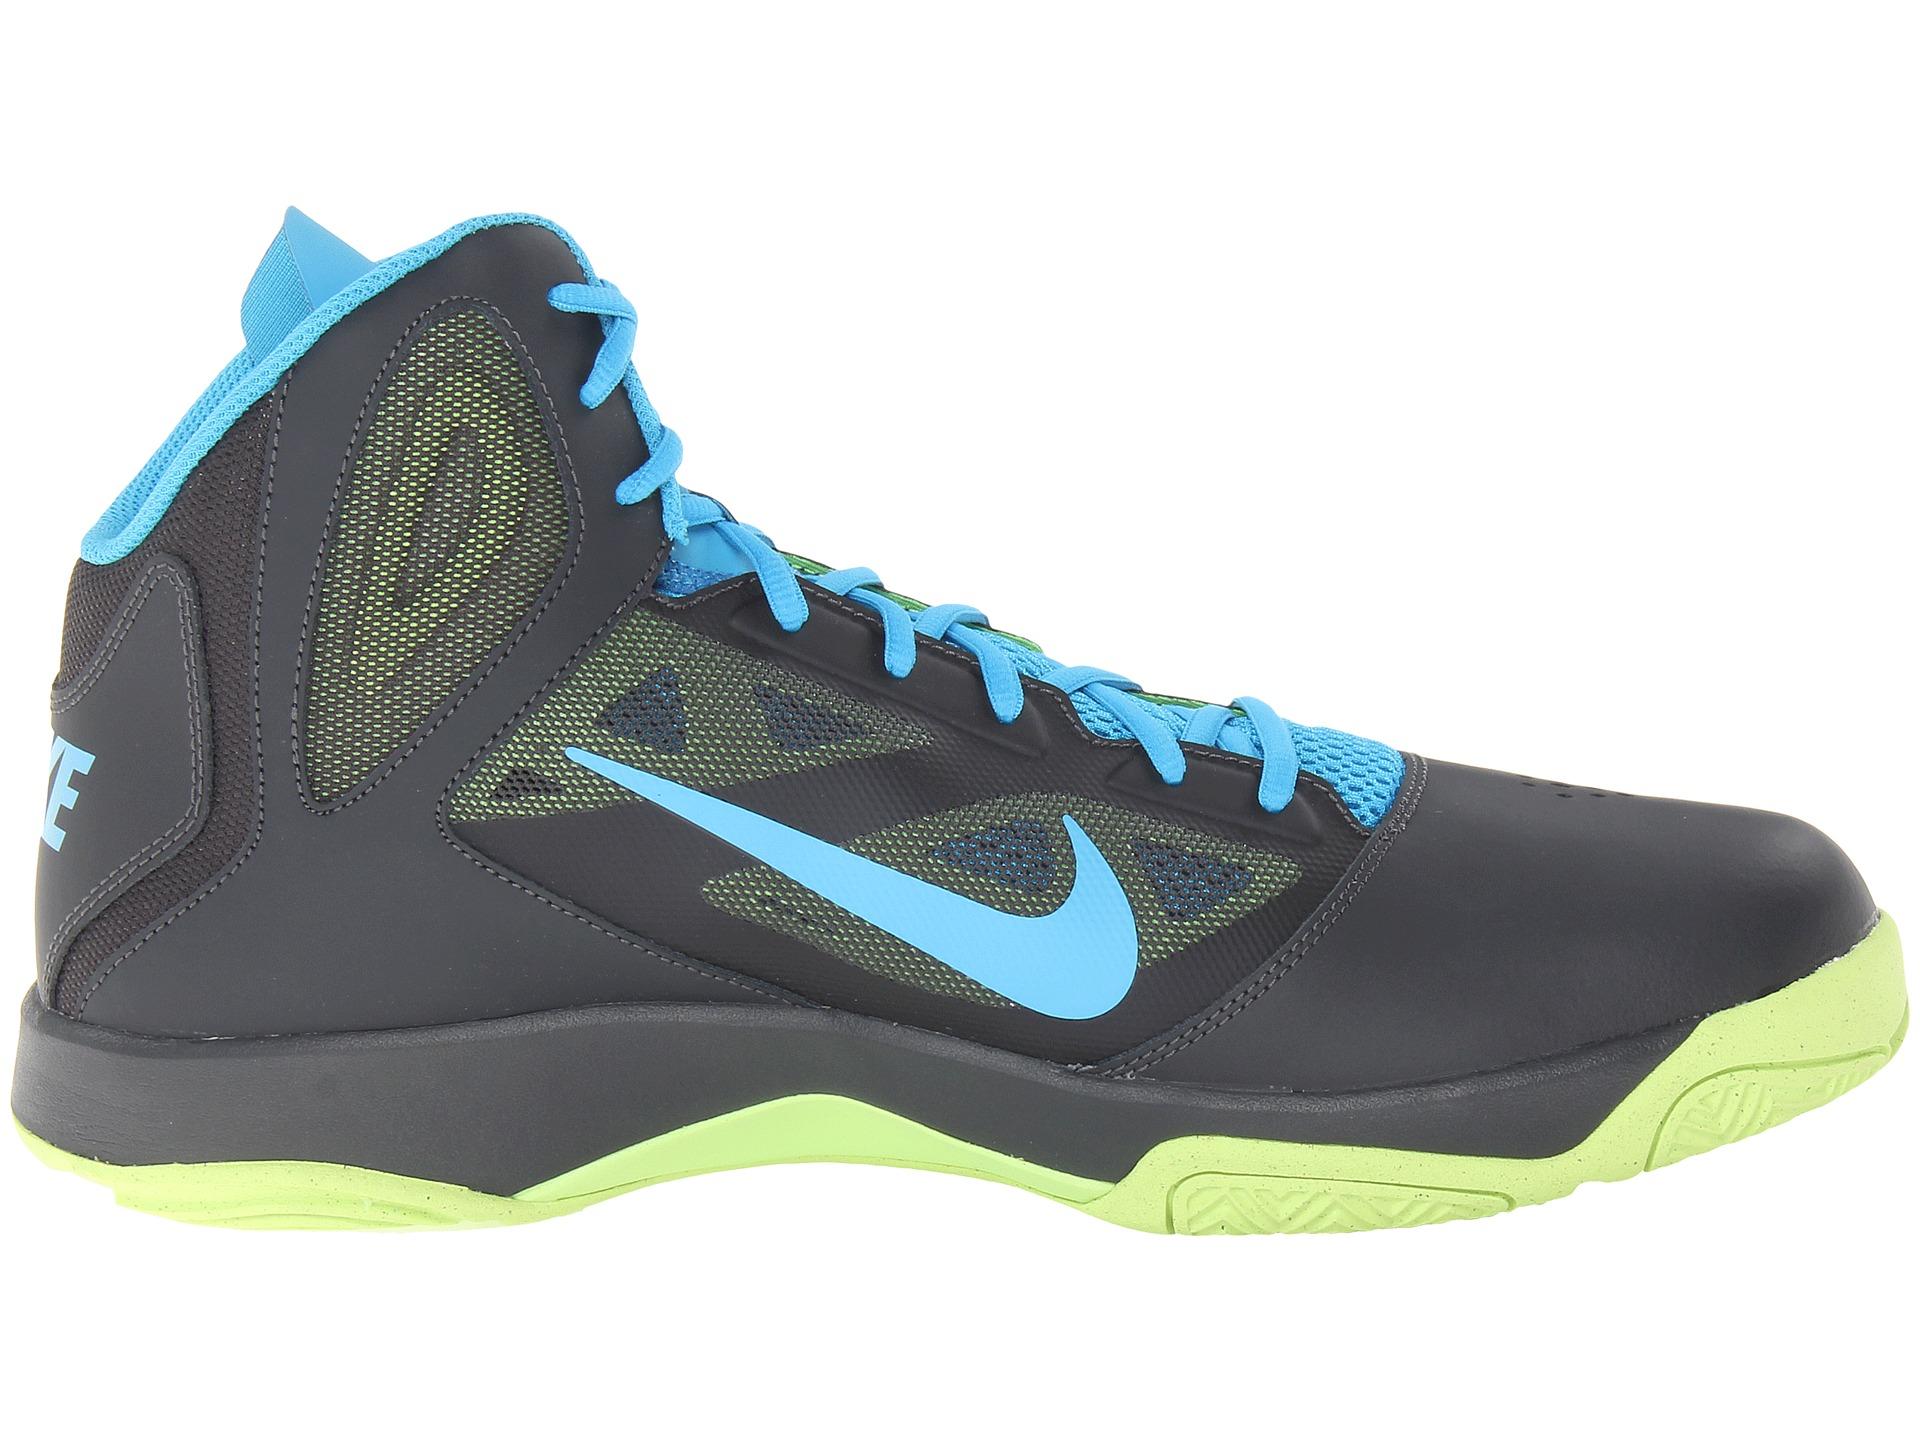 e93d94495265 Nike Womens Boys Basketball Shoes Zappos - Praesta